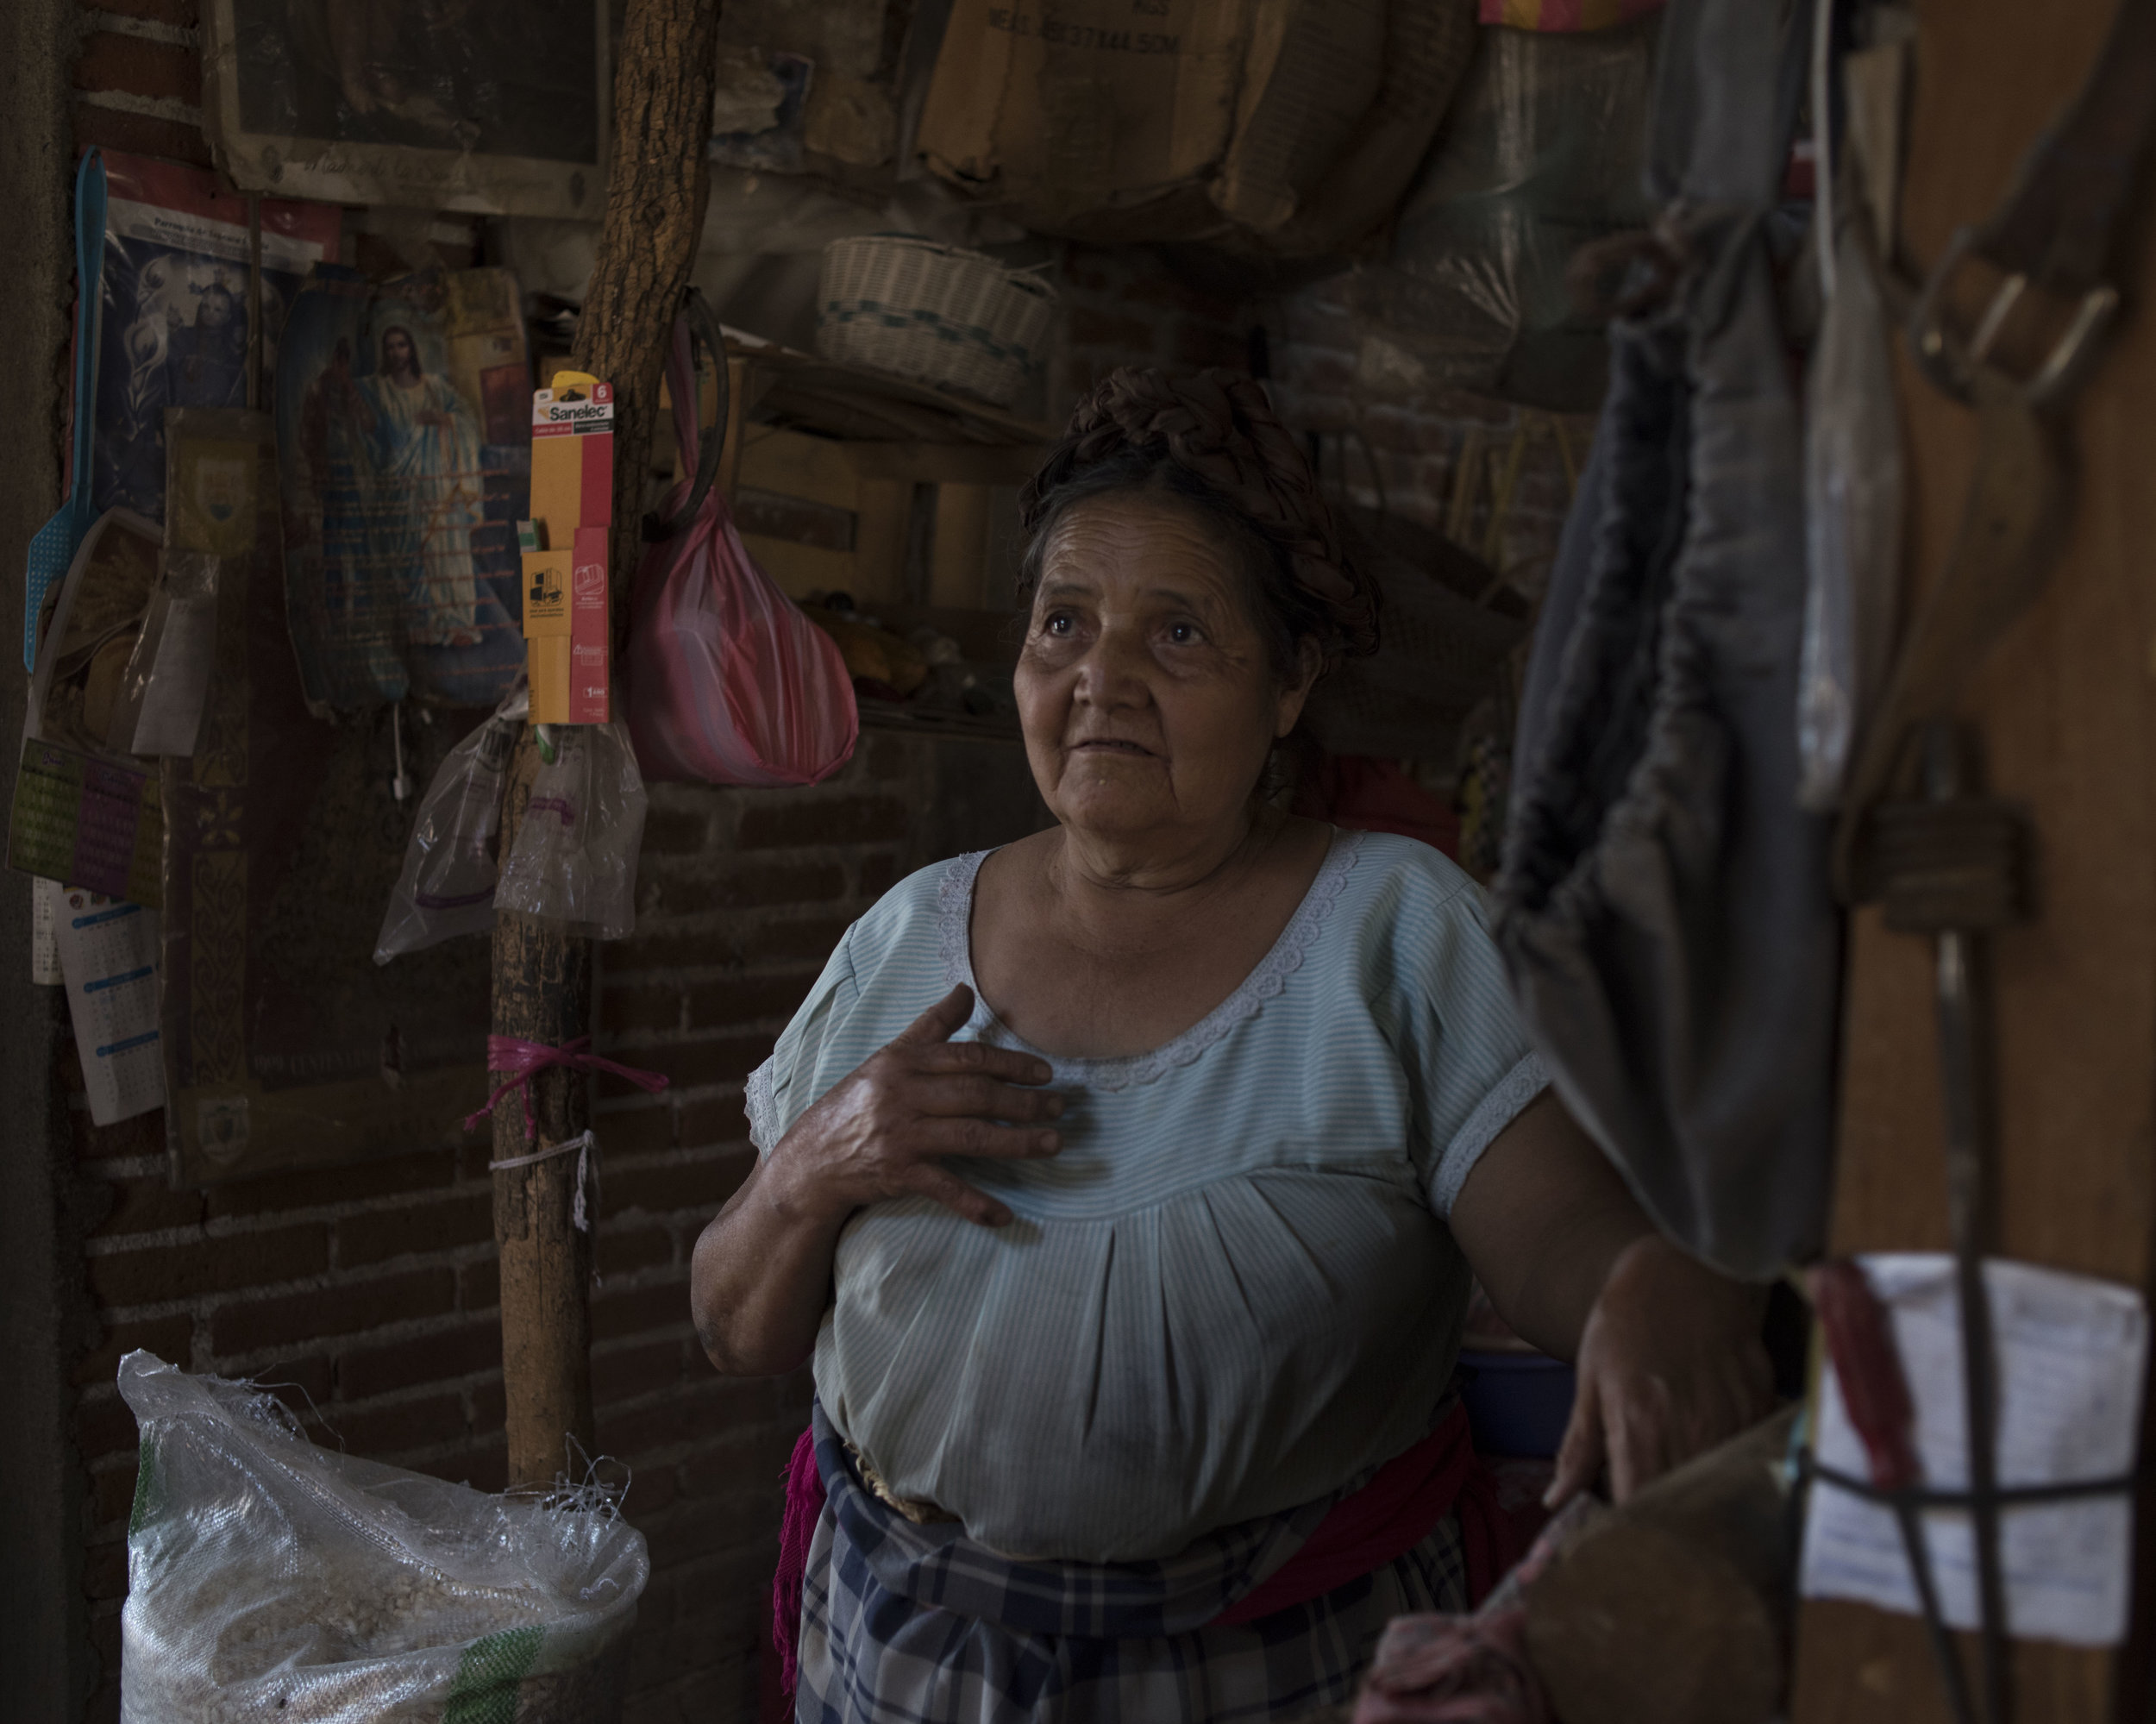 Petra Gonzalez Martinez, Teotitlan, OAX.